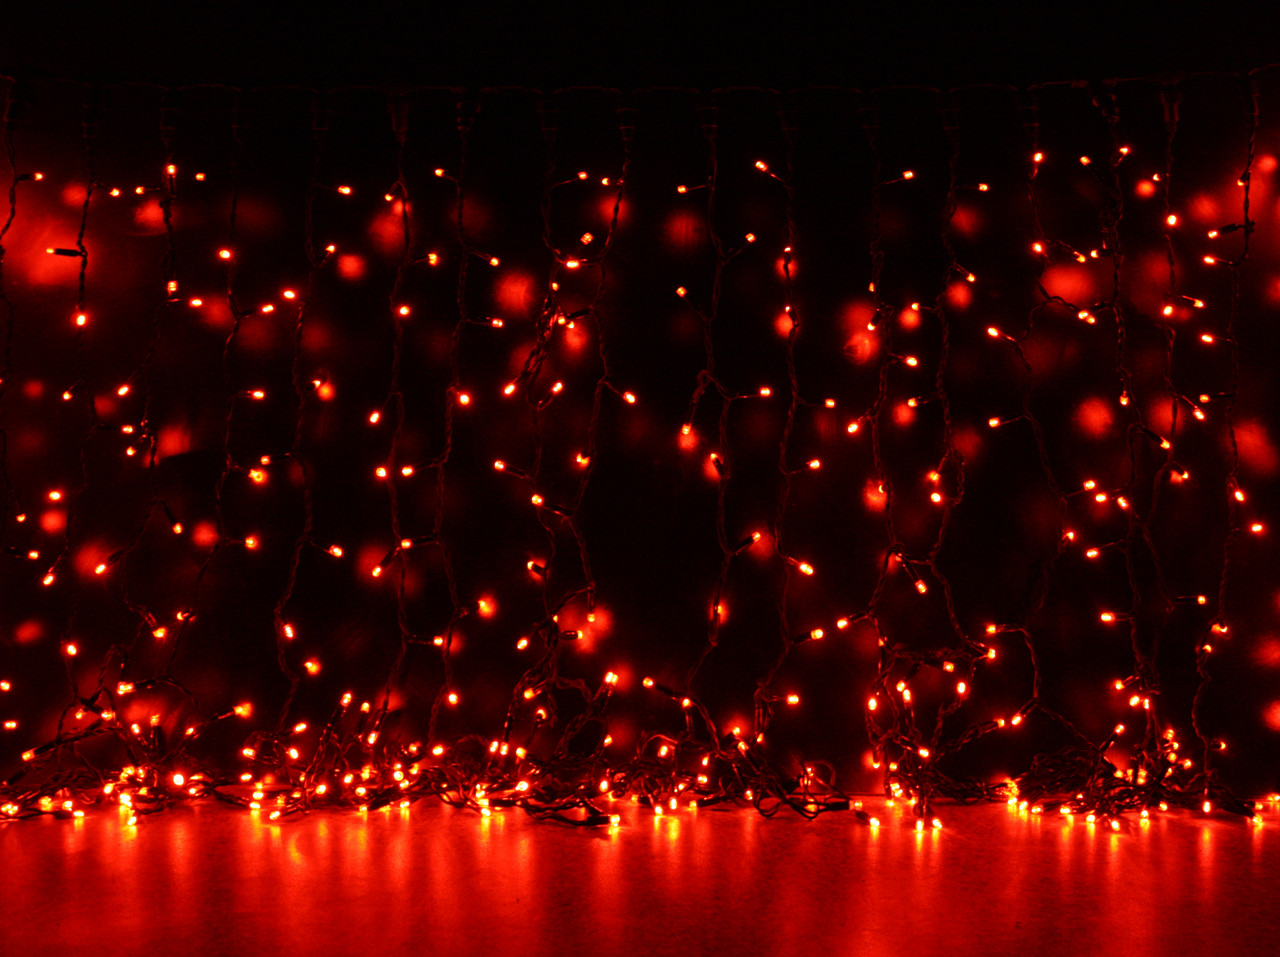 Уличная светодиодная гирлянда Штора Lumion Curtain (Куртейн) 456 led наружная цвет красный